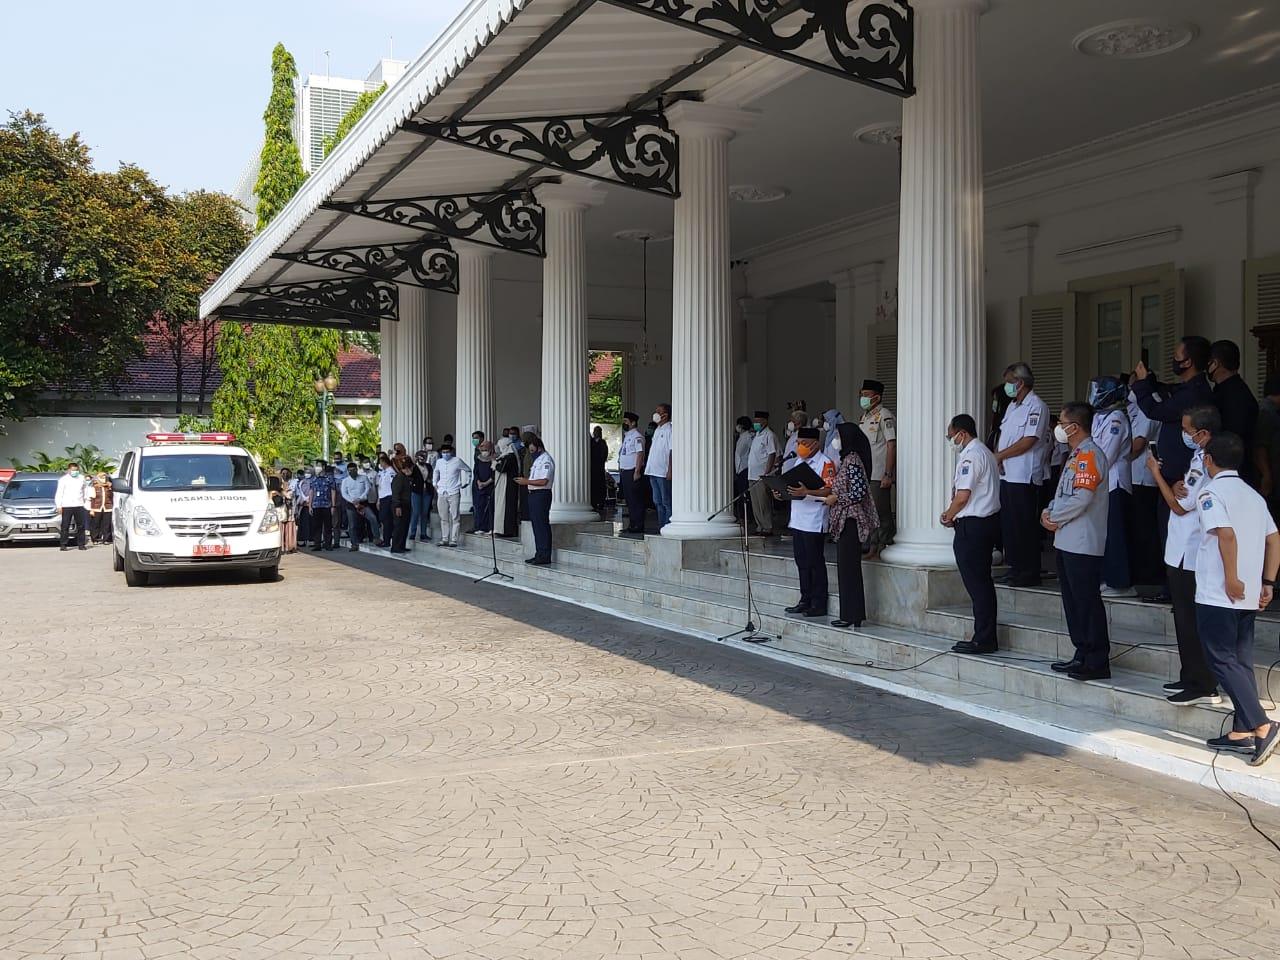 Dua Pejabat Eselon Terpapar Covid-19, Balai Kota Jakarta Ditutup Selama 3 Hari Untuk Disinfektasi